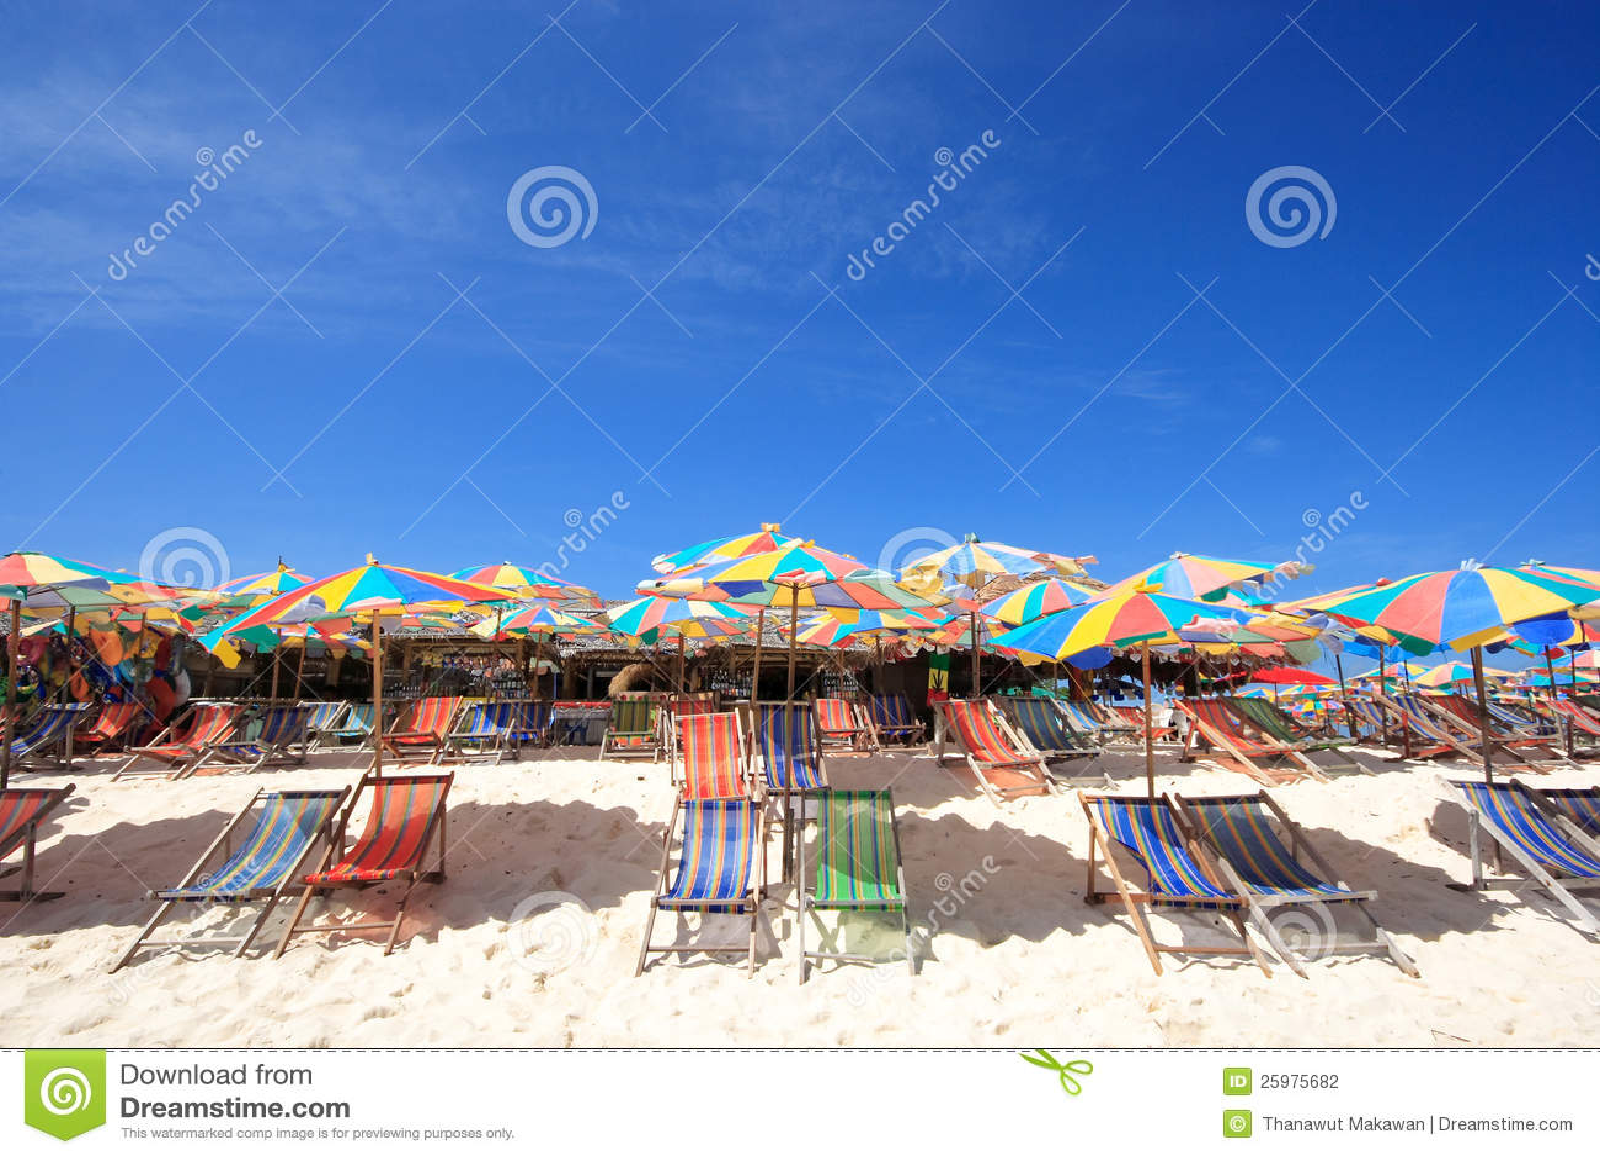 Beach Chair And Colorful Beach Umbrella Stock Photo